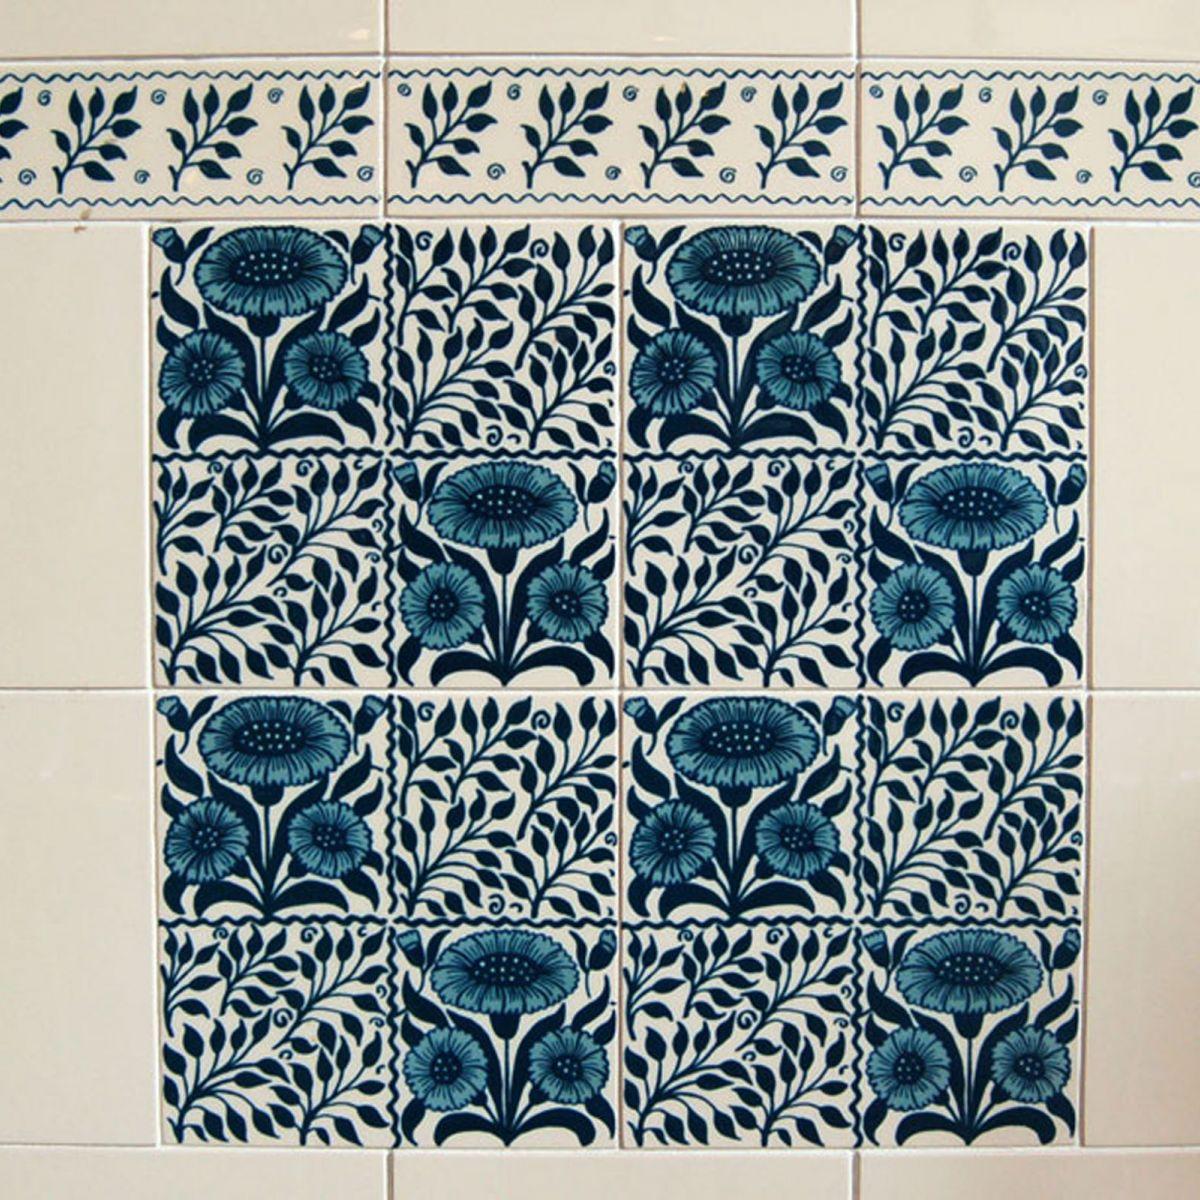 Victorian Oreton blue Classic Printed decorative tiles 152x152mm